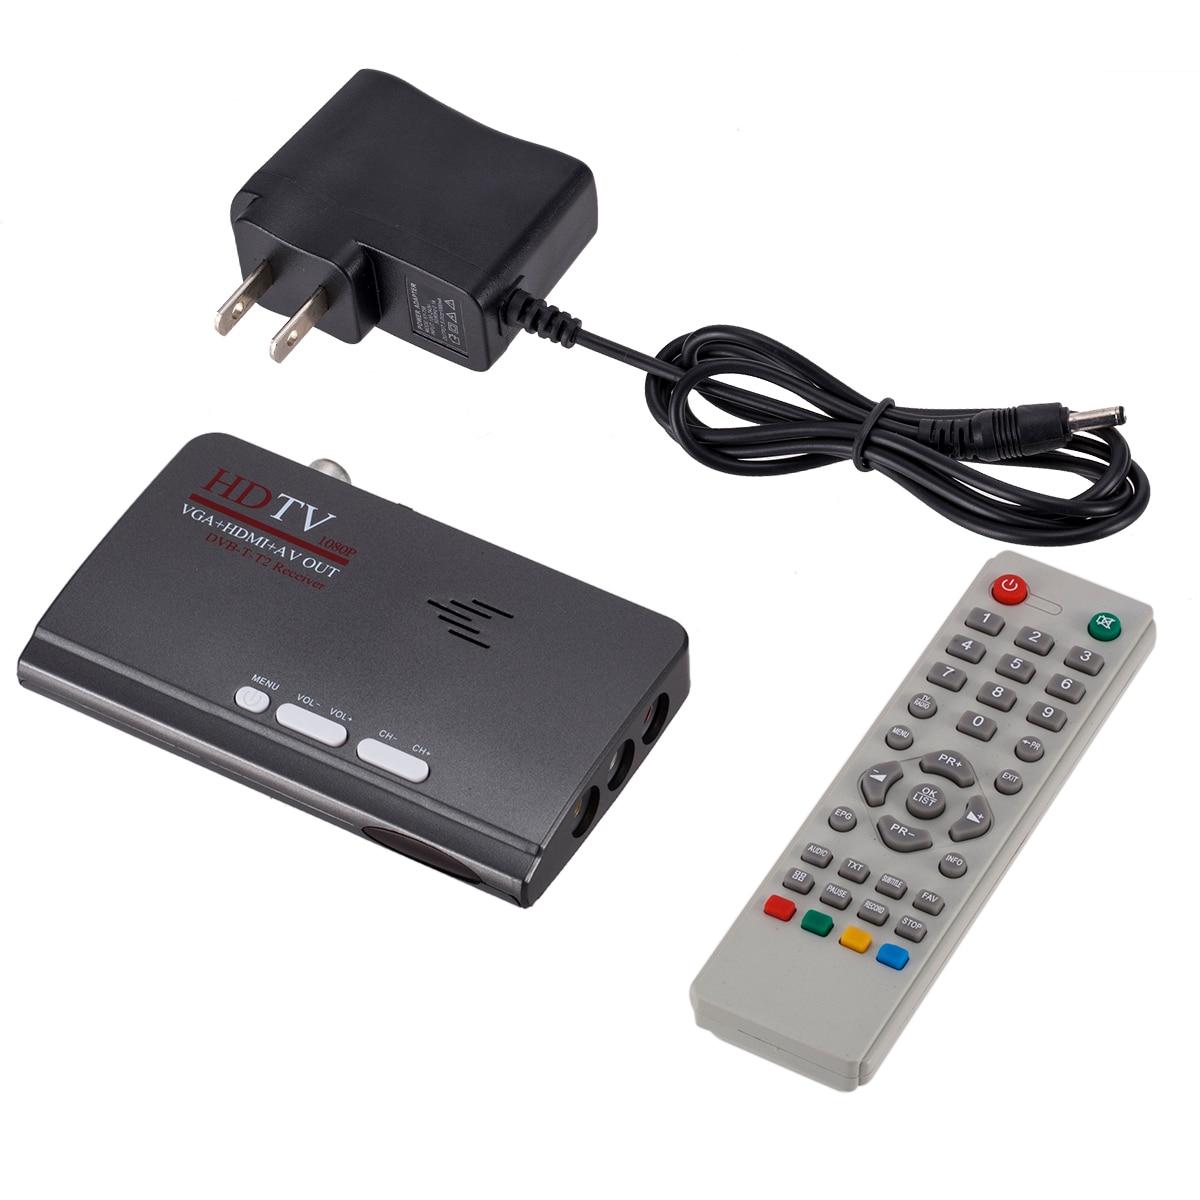 TV Tuner Receiver Tv-Box DVB-T2 Hdmi Digital VGA AV 1080P CVBS With Remote-Control